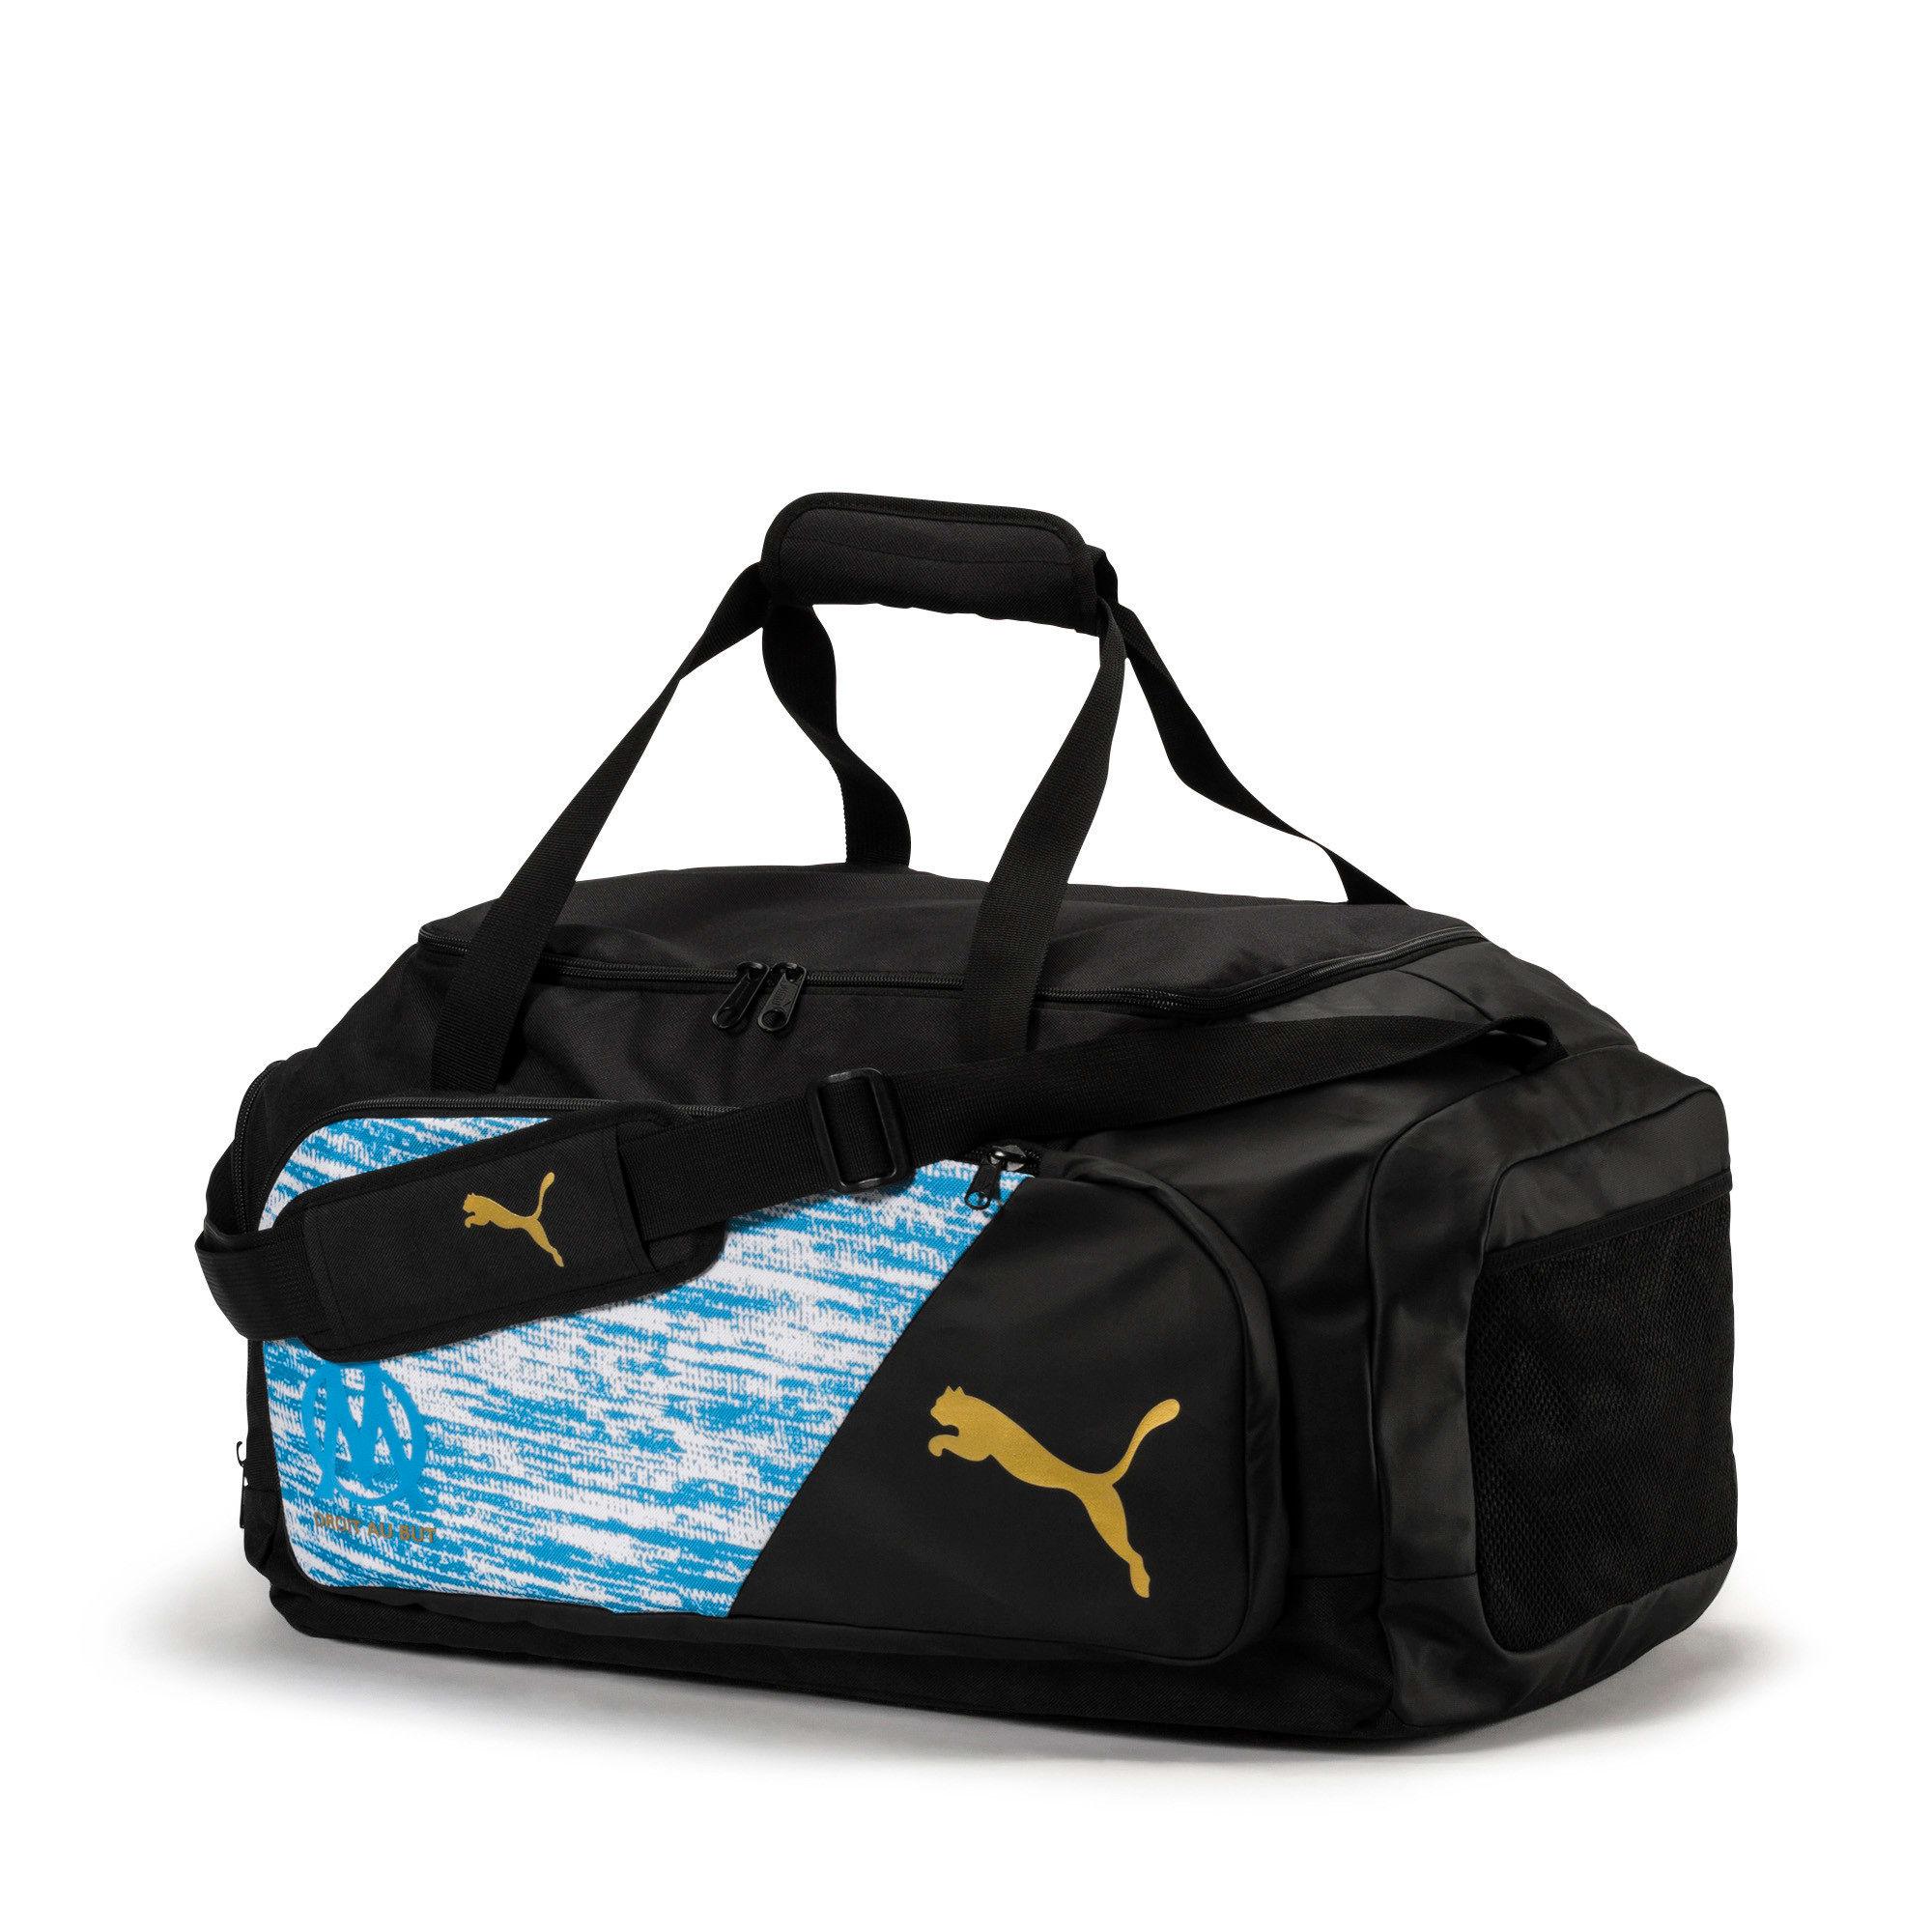 Thumbnail 1 of Olympique de Marseille LIGA Medium Bag, AZURE BLUE-Puma Black, medium